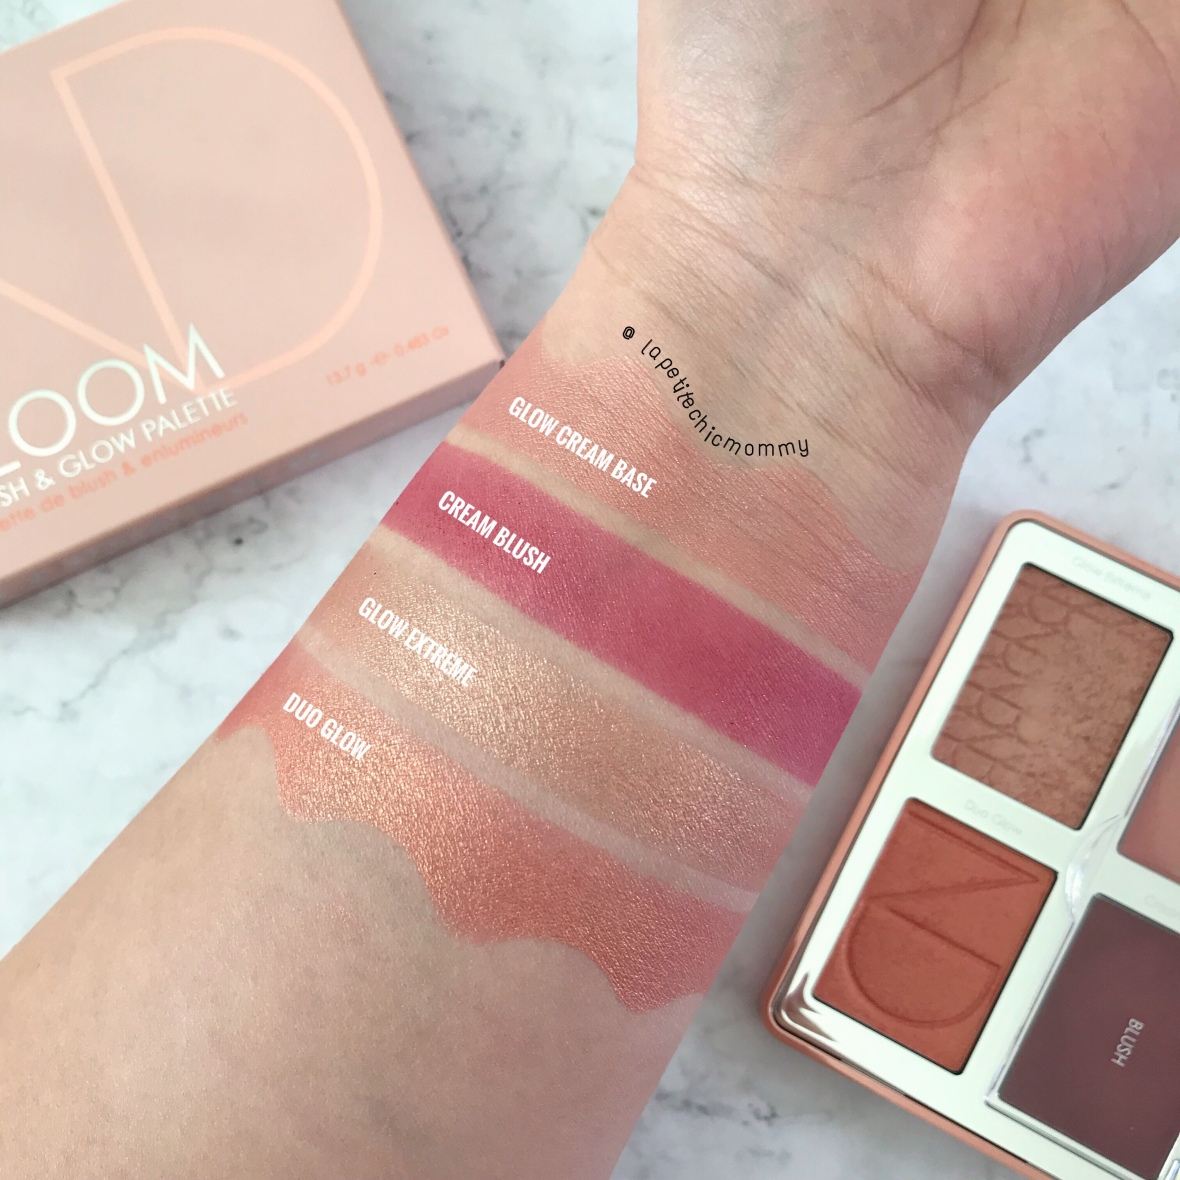 Bloom Blush & Glow Palette by Natasha Denona #12